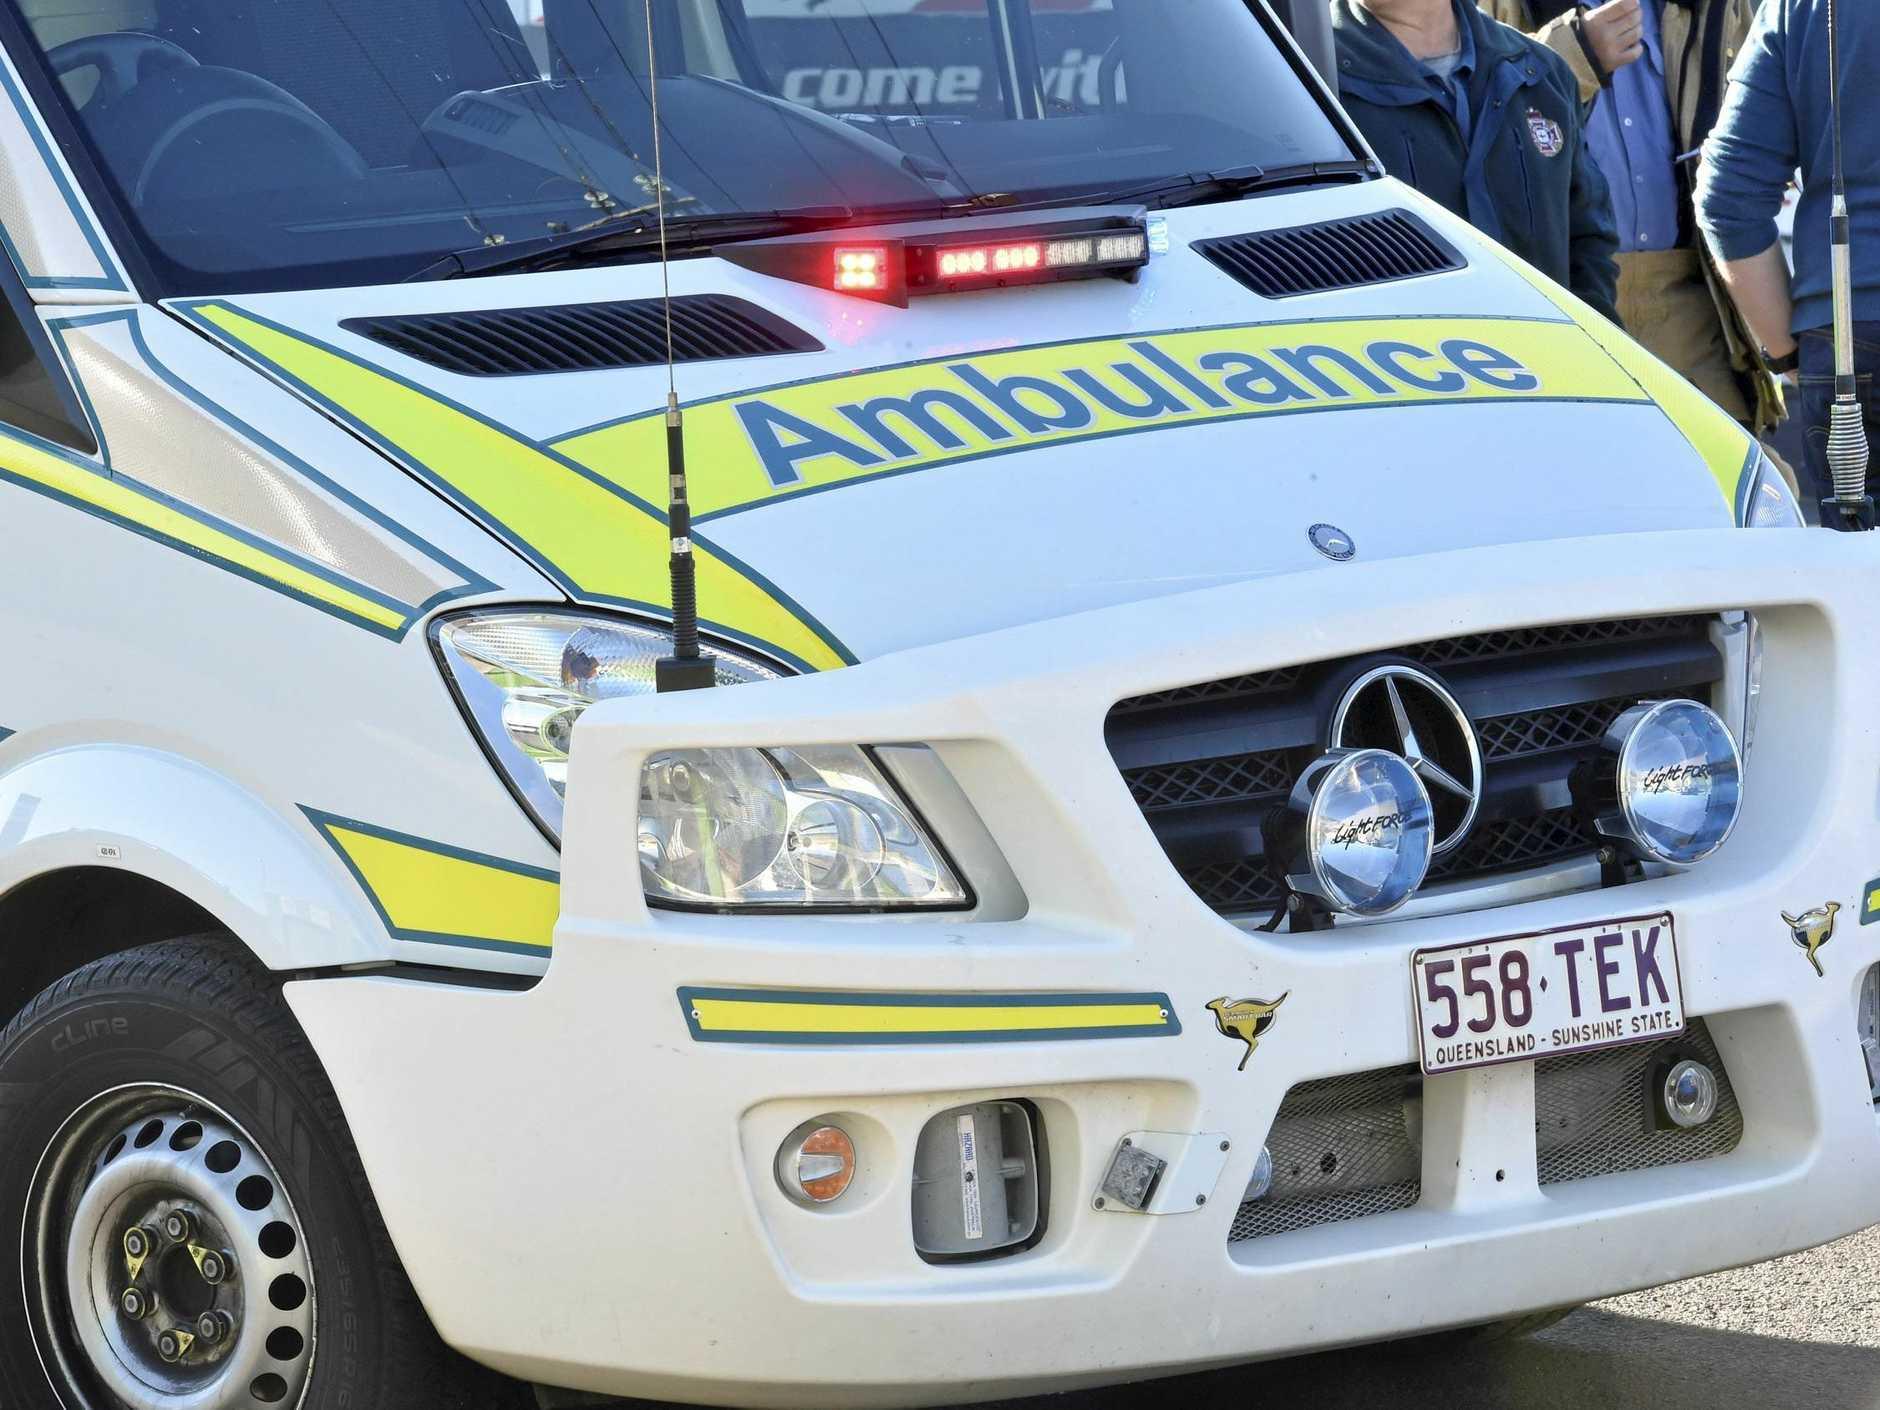 Three children were taken to hospital after their school bus crashed yesterday.